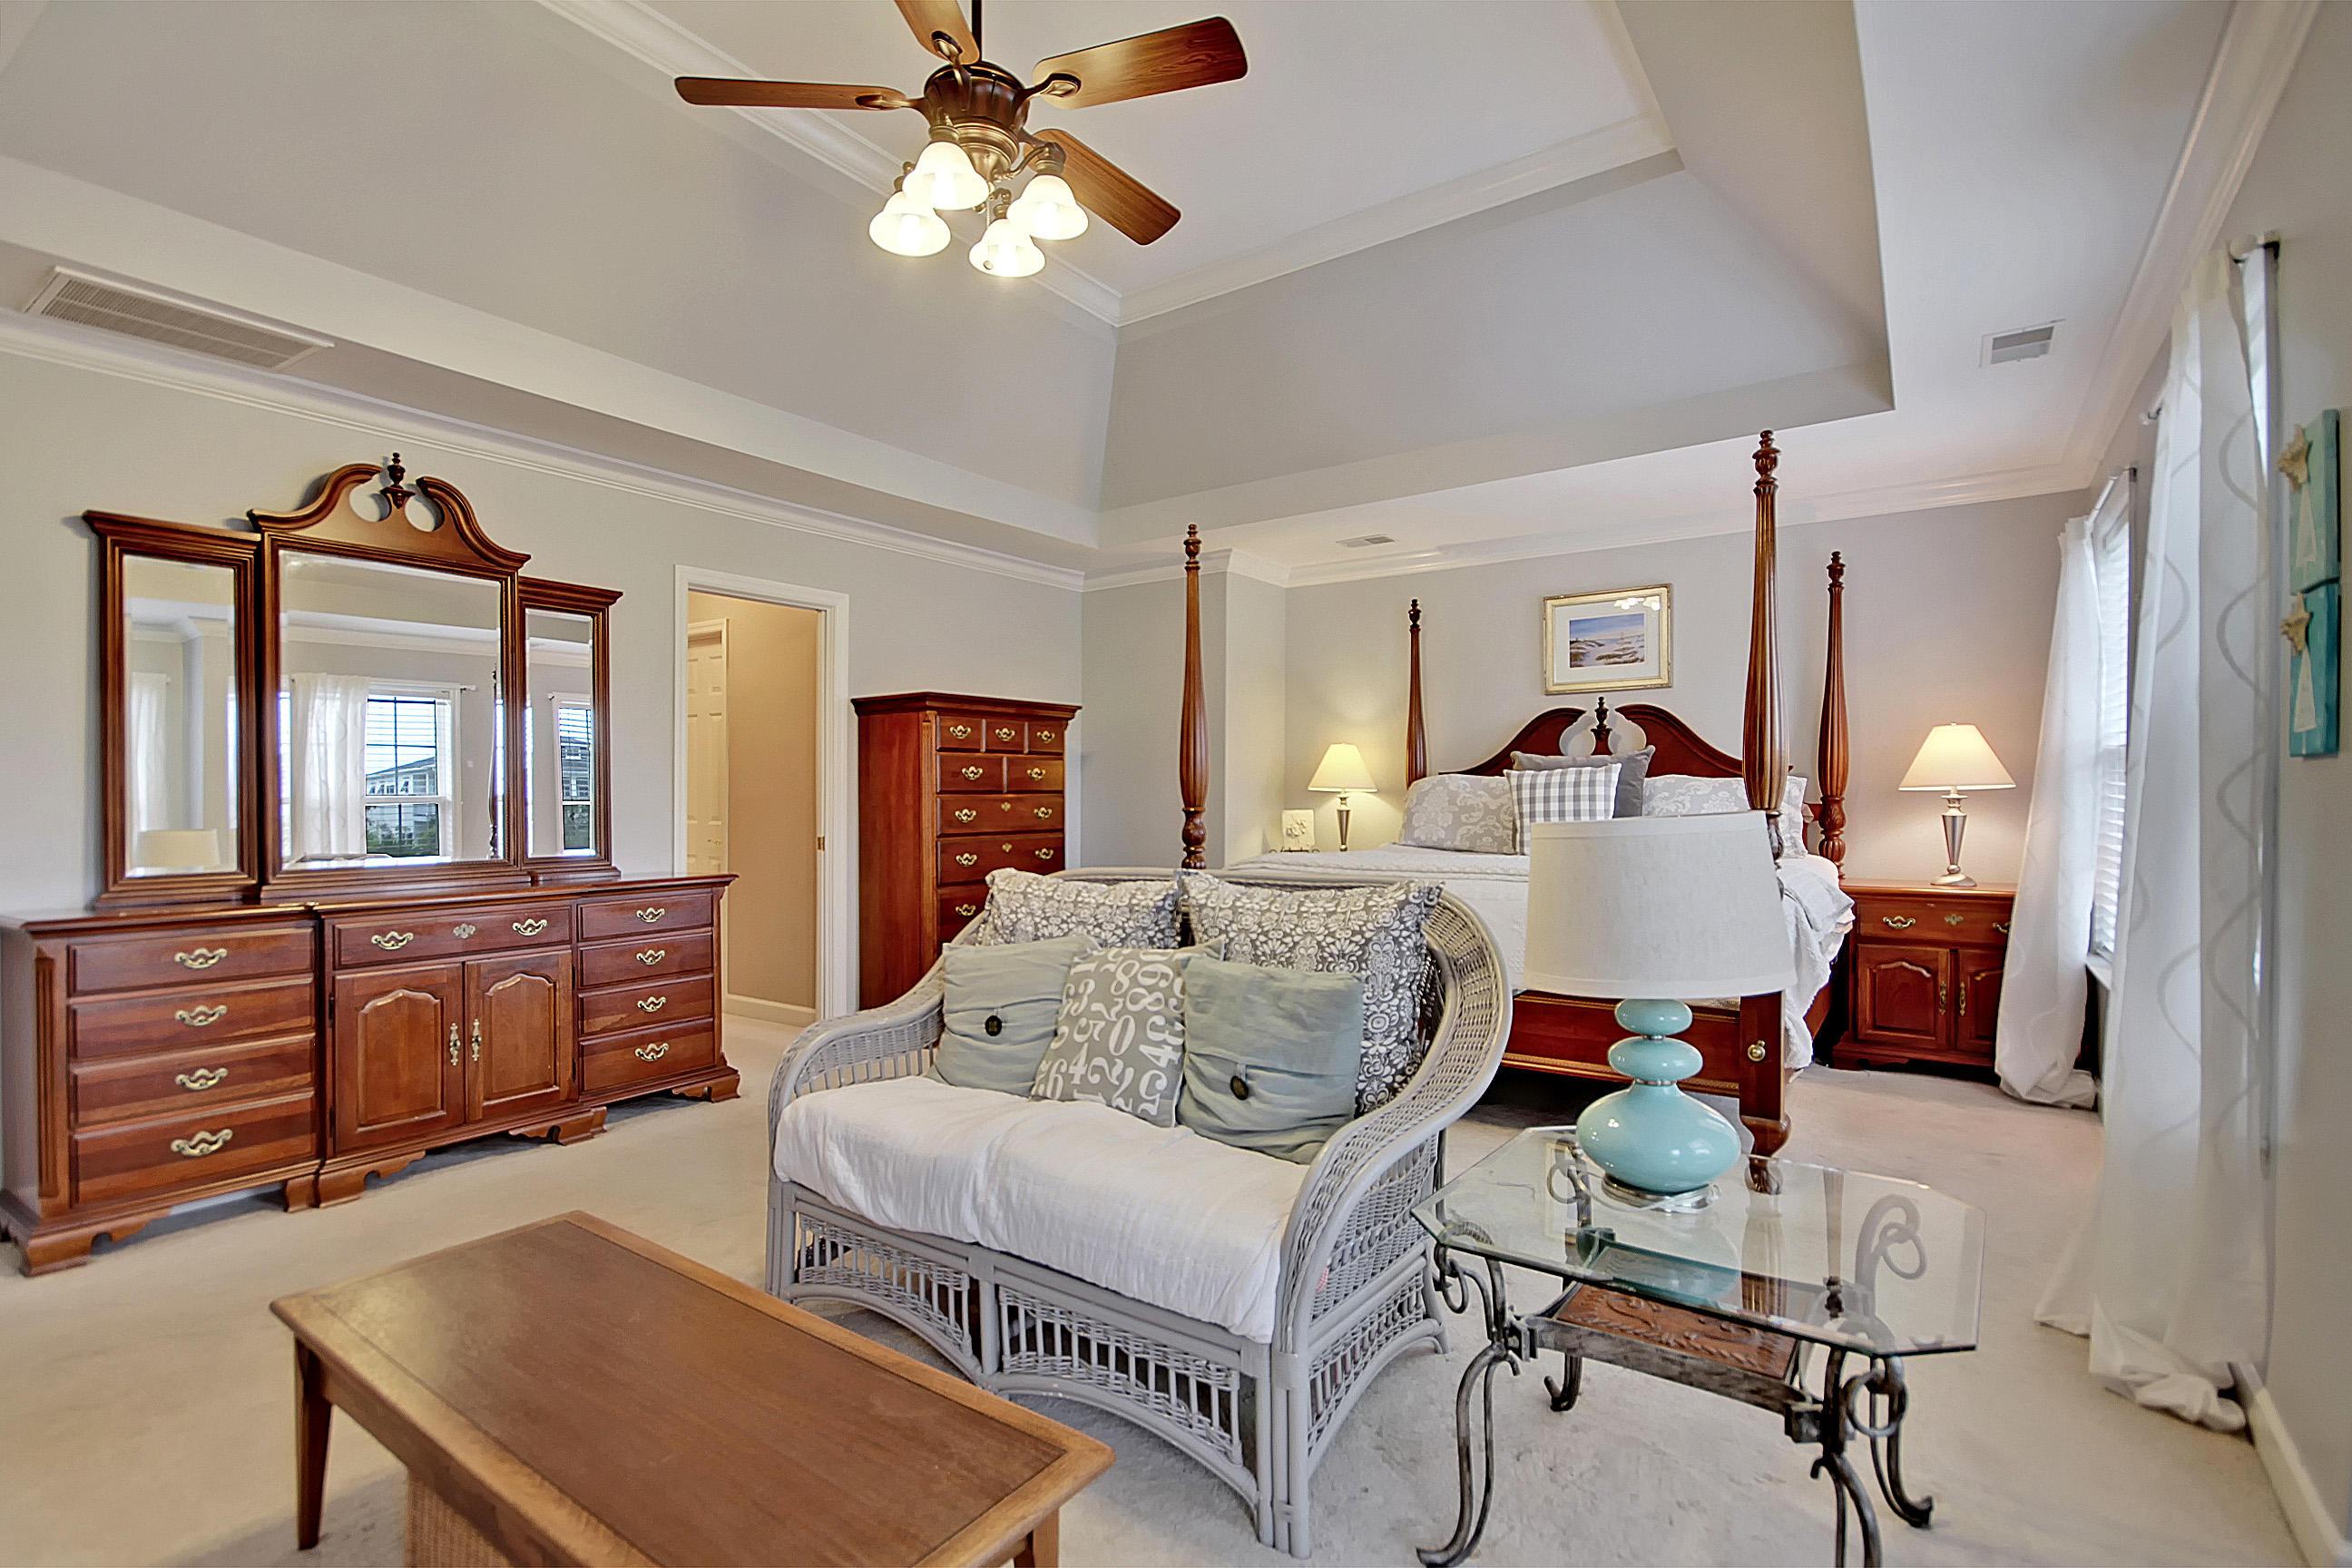 Dunes West Homes For Sale - 2449 Darts Cove, Mount Pleasant, SC - 15